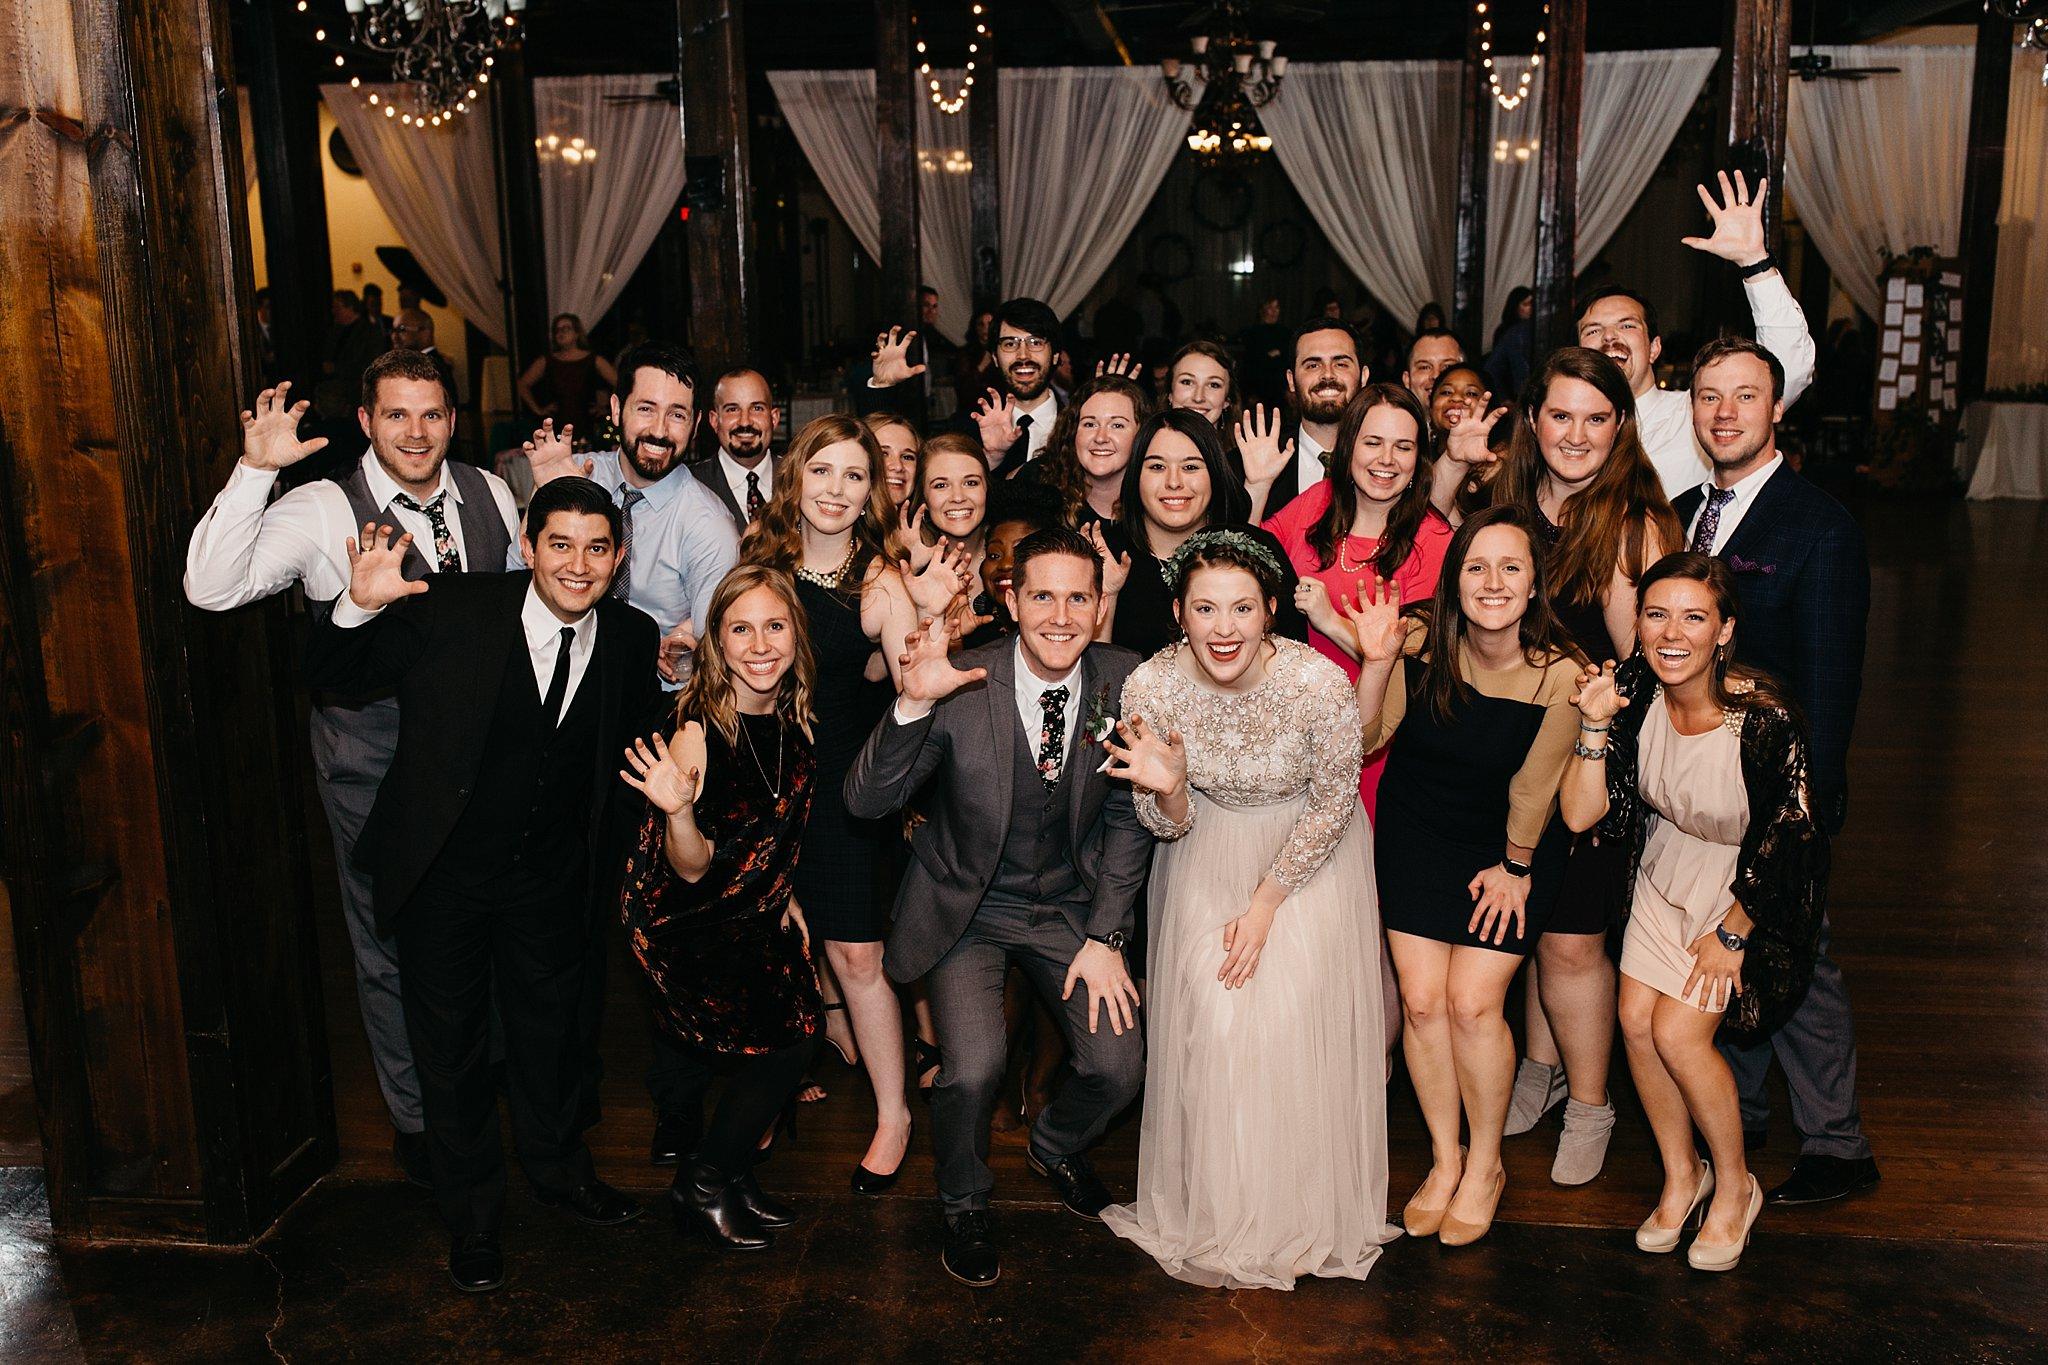 Wilderlove Co_Waco Texas_The Phoenix_Romantic Wedding Photography_0093.jpg